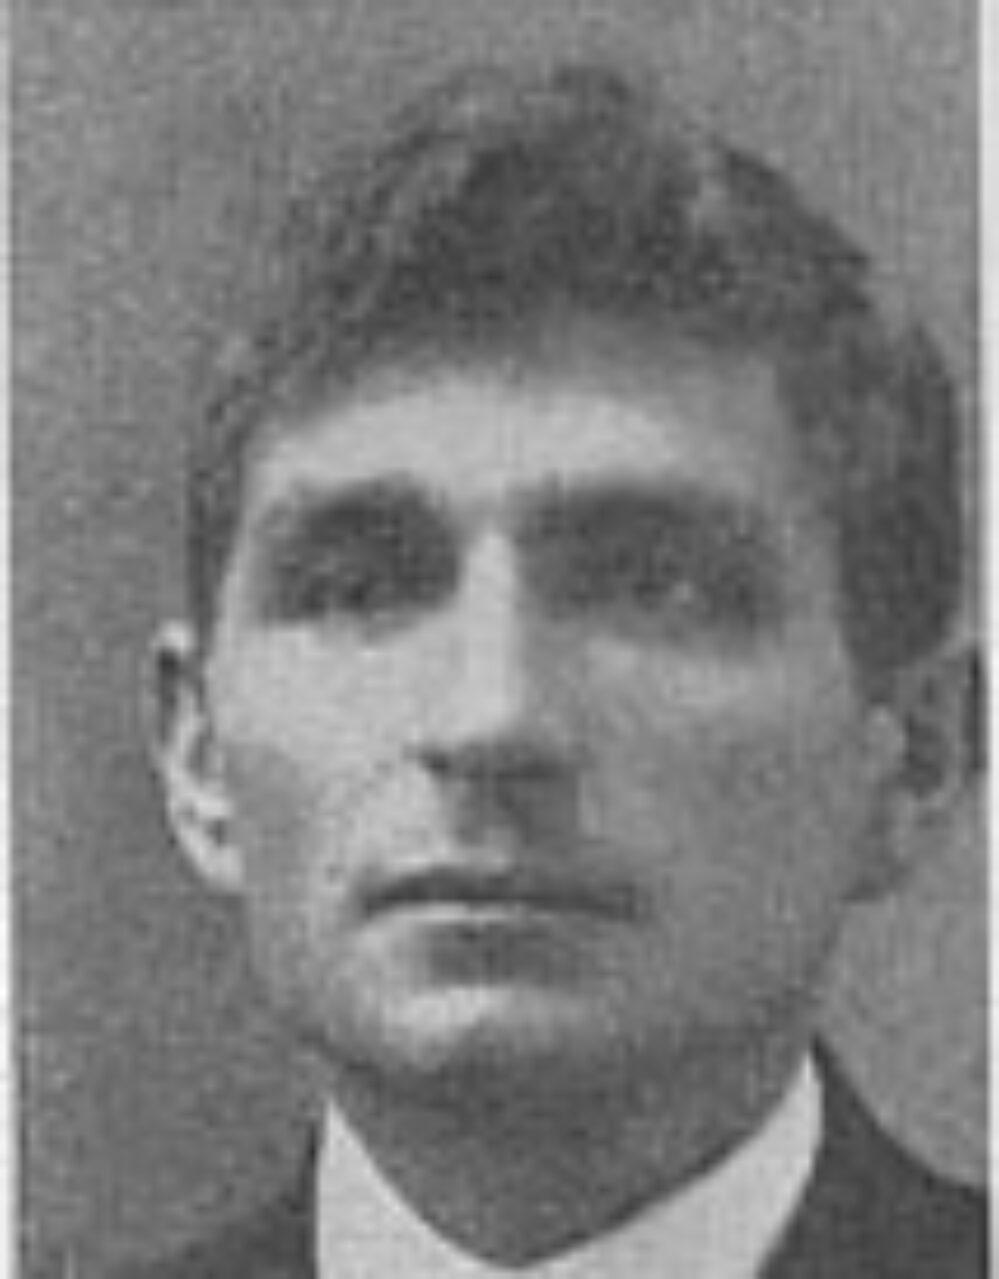 Hans Petter Jakobsen